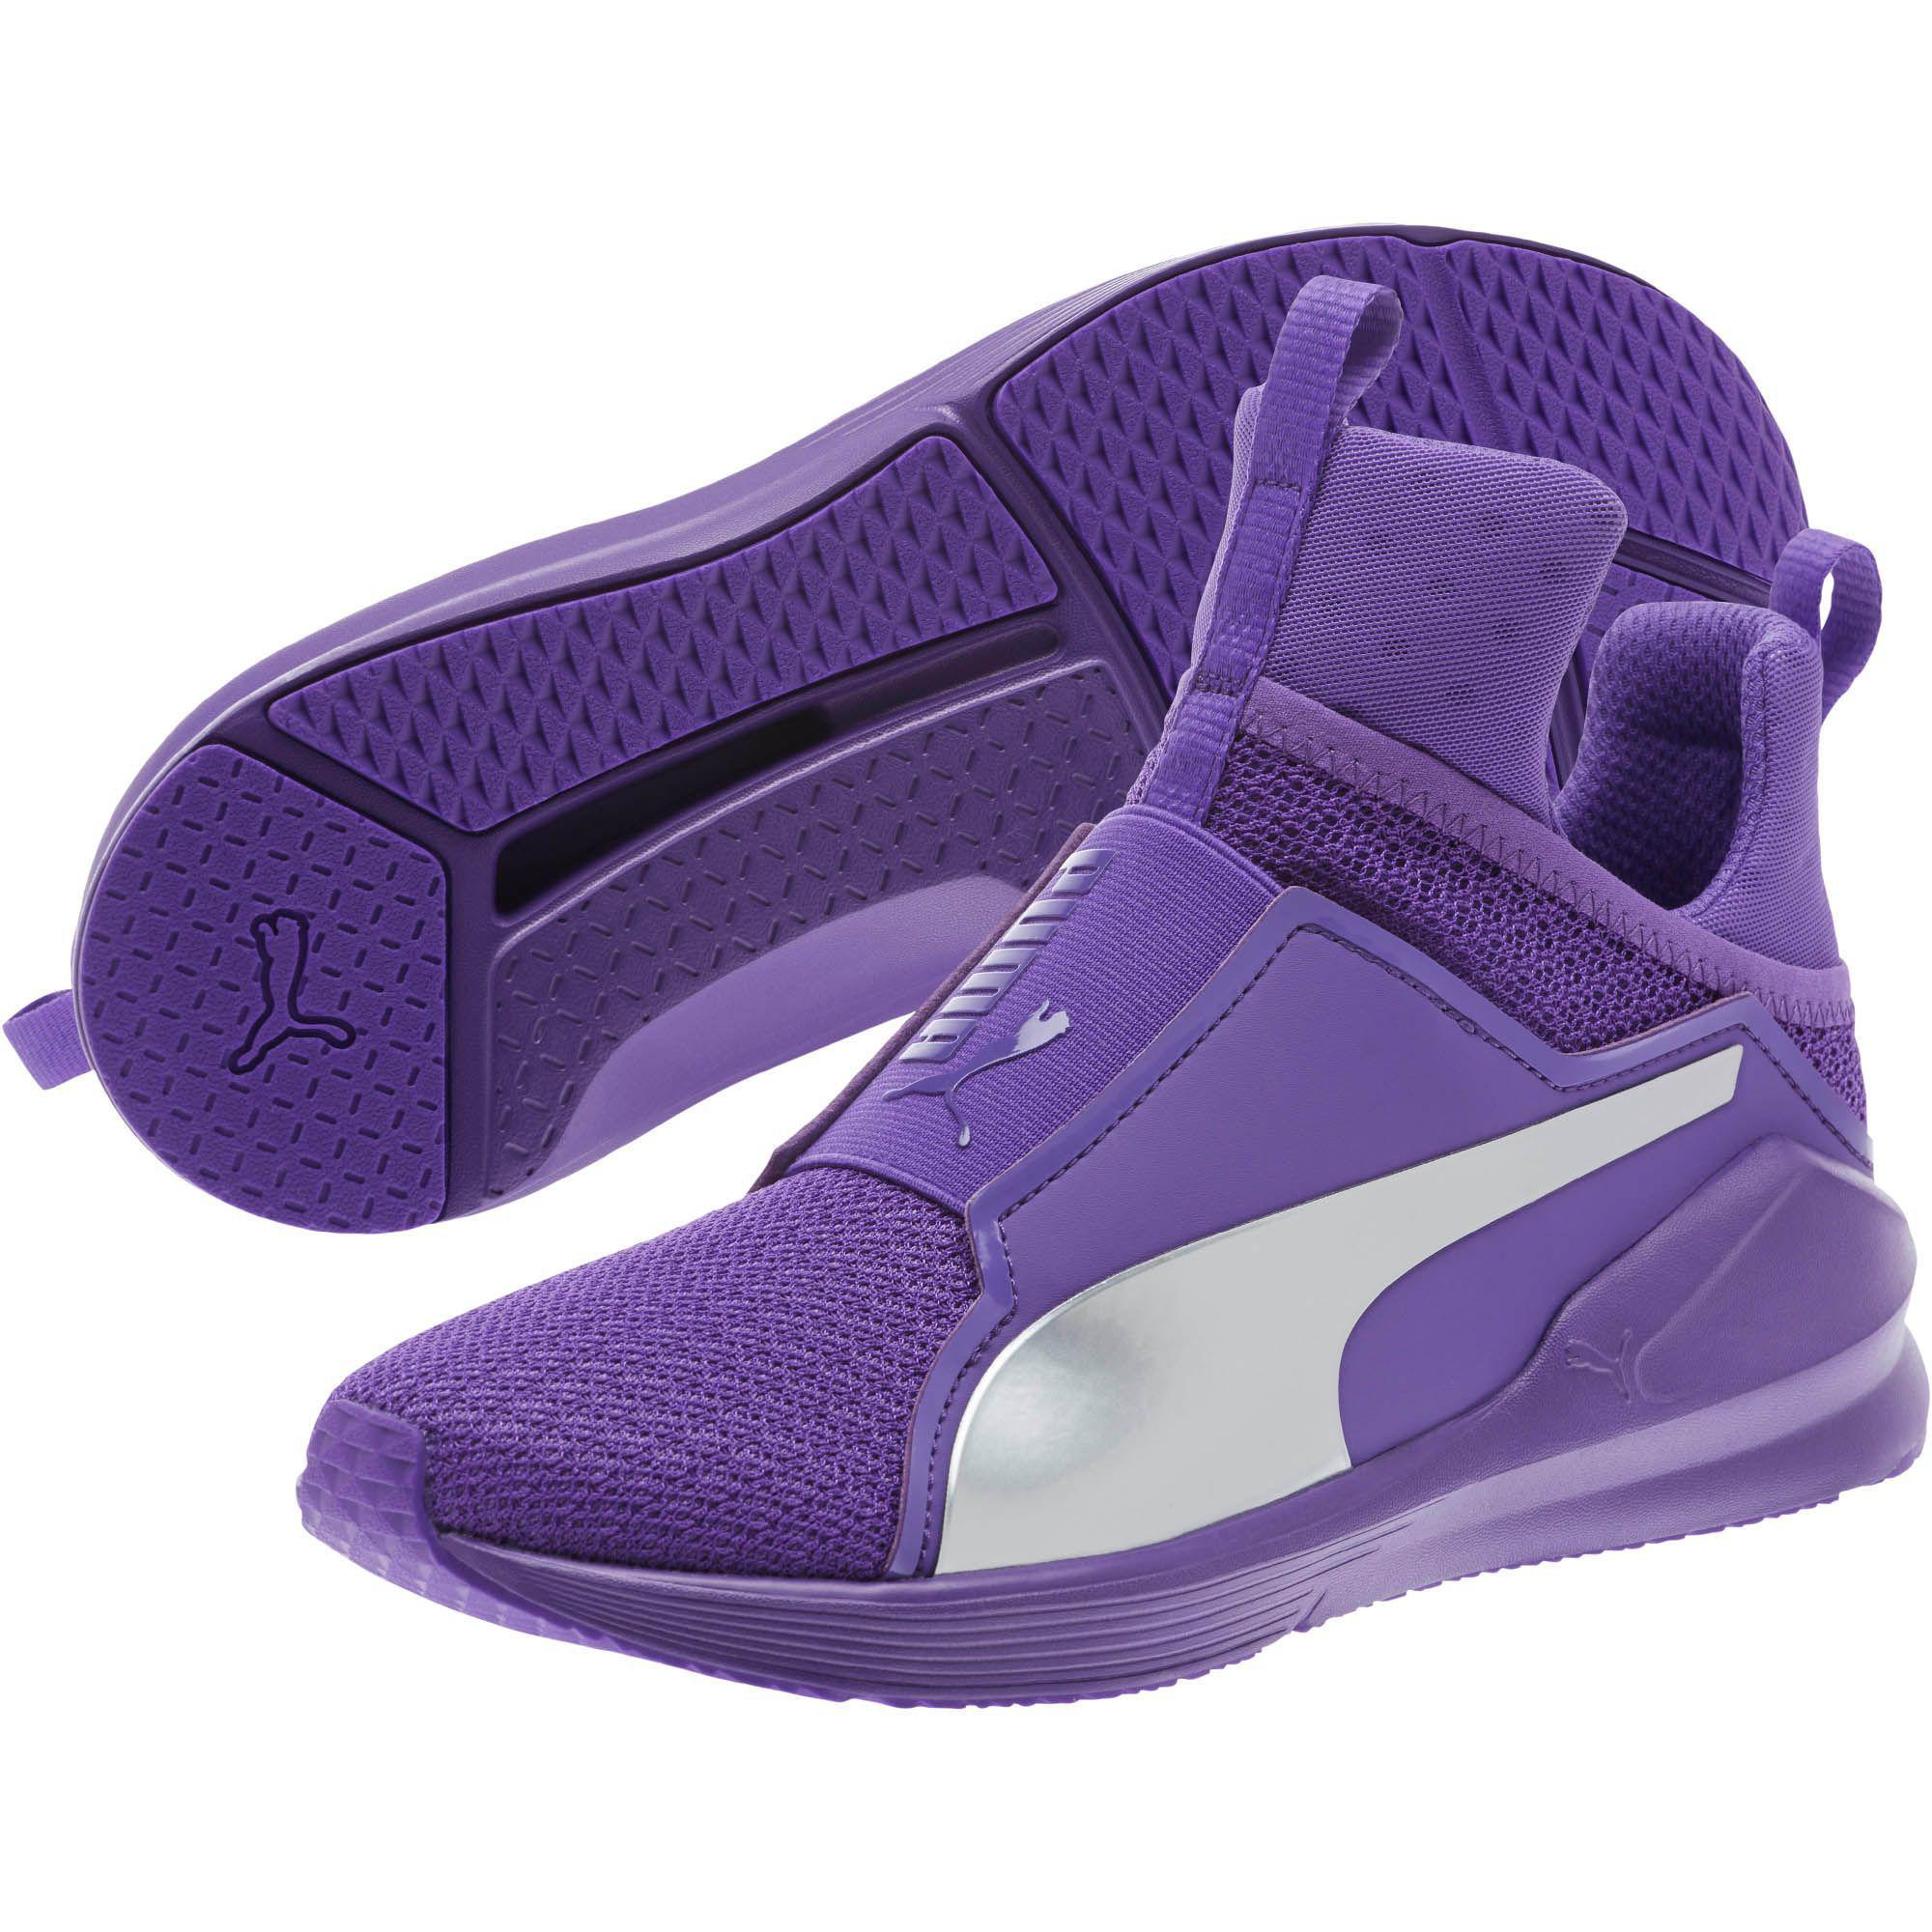 4a6dbf38d4a4 Lyst - PUMA Fierce Culture Surf Women s Training Shoes in Purple